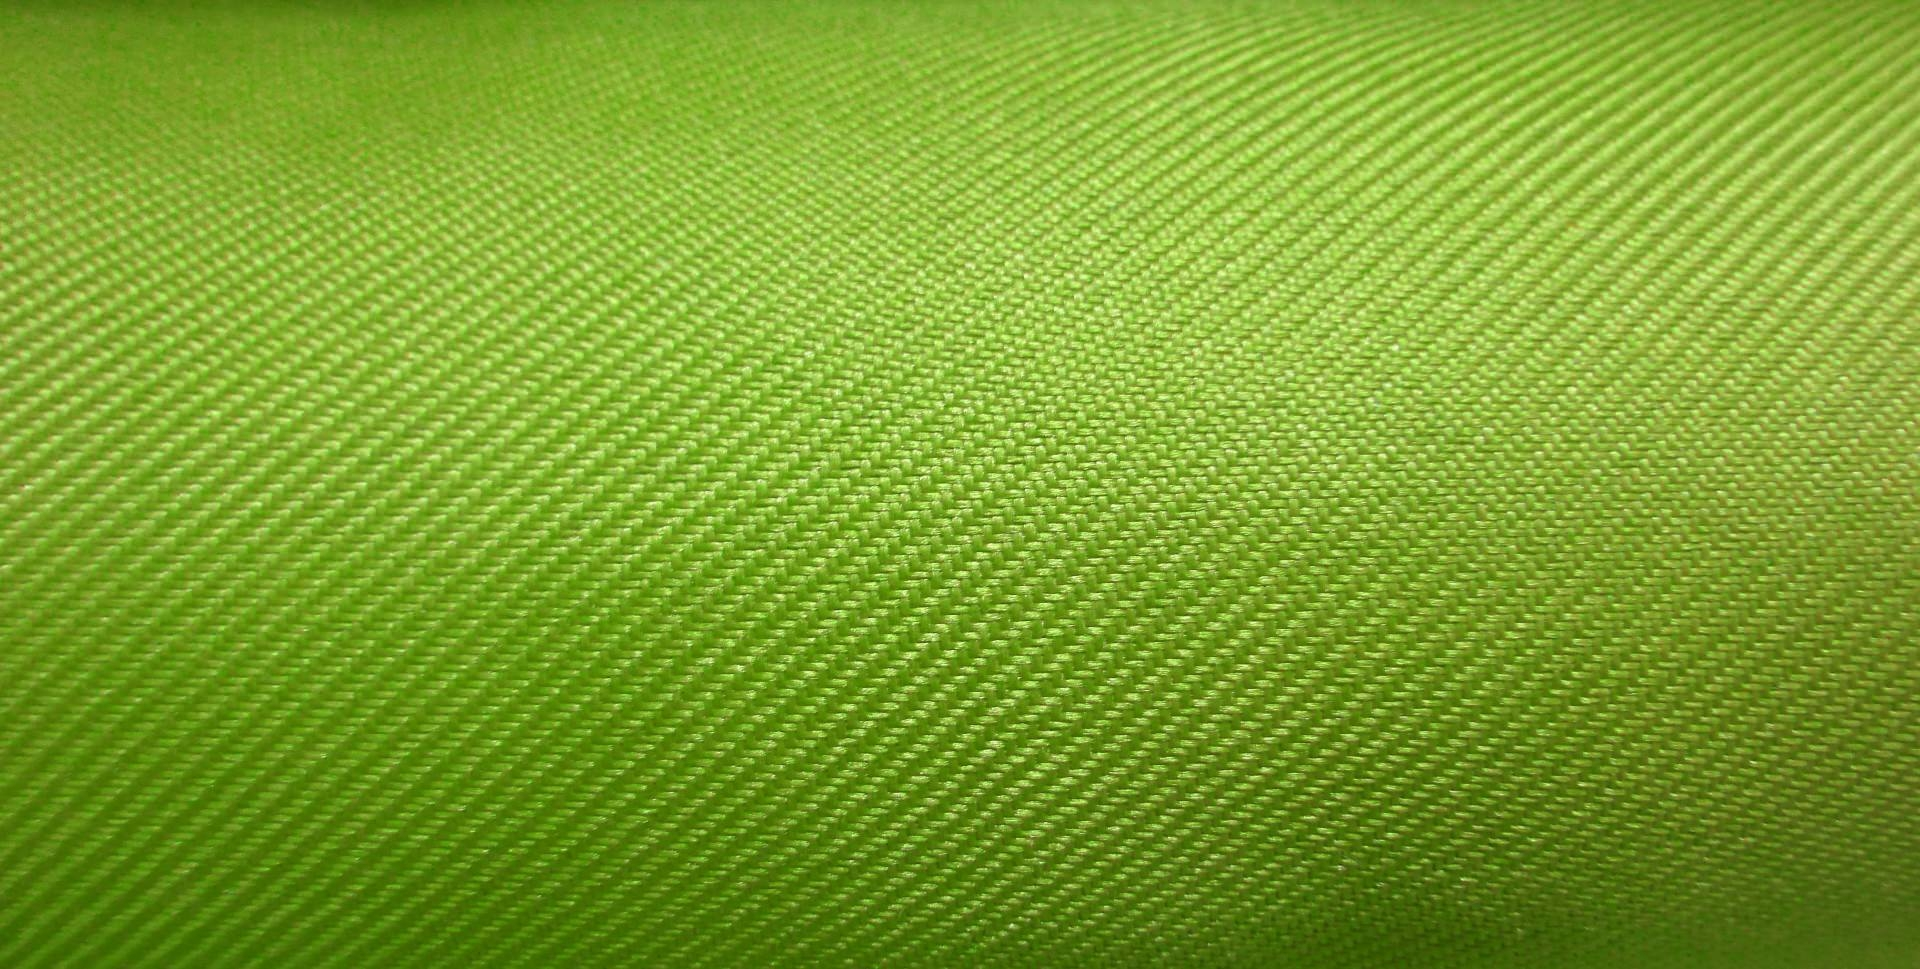 Green Textured Closeup Background